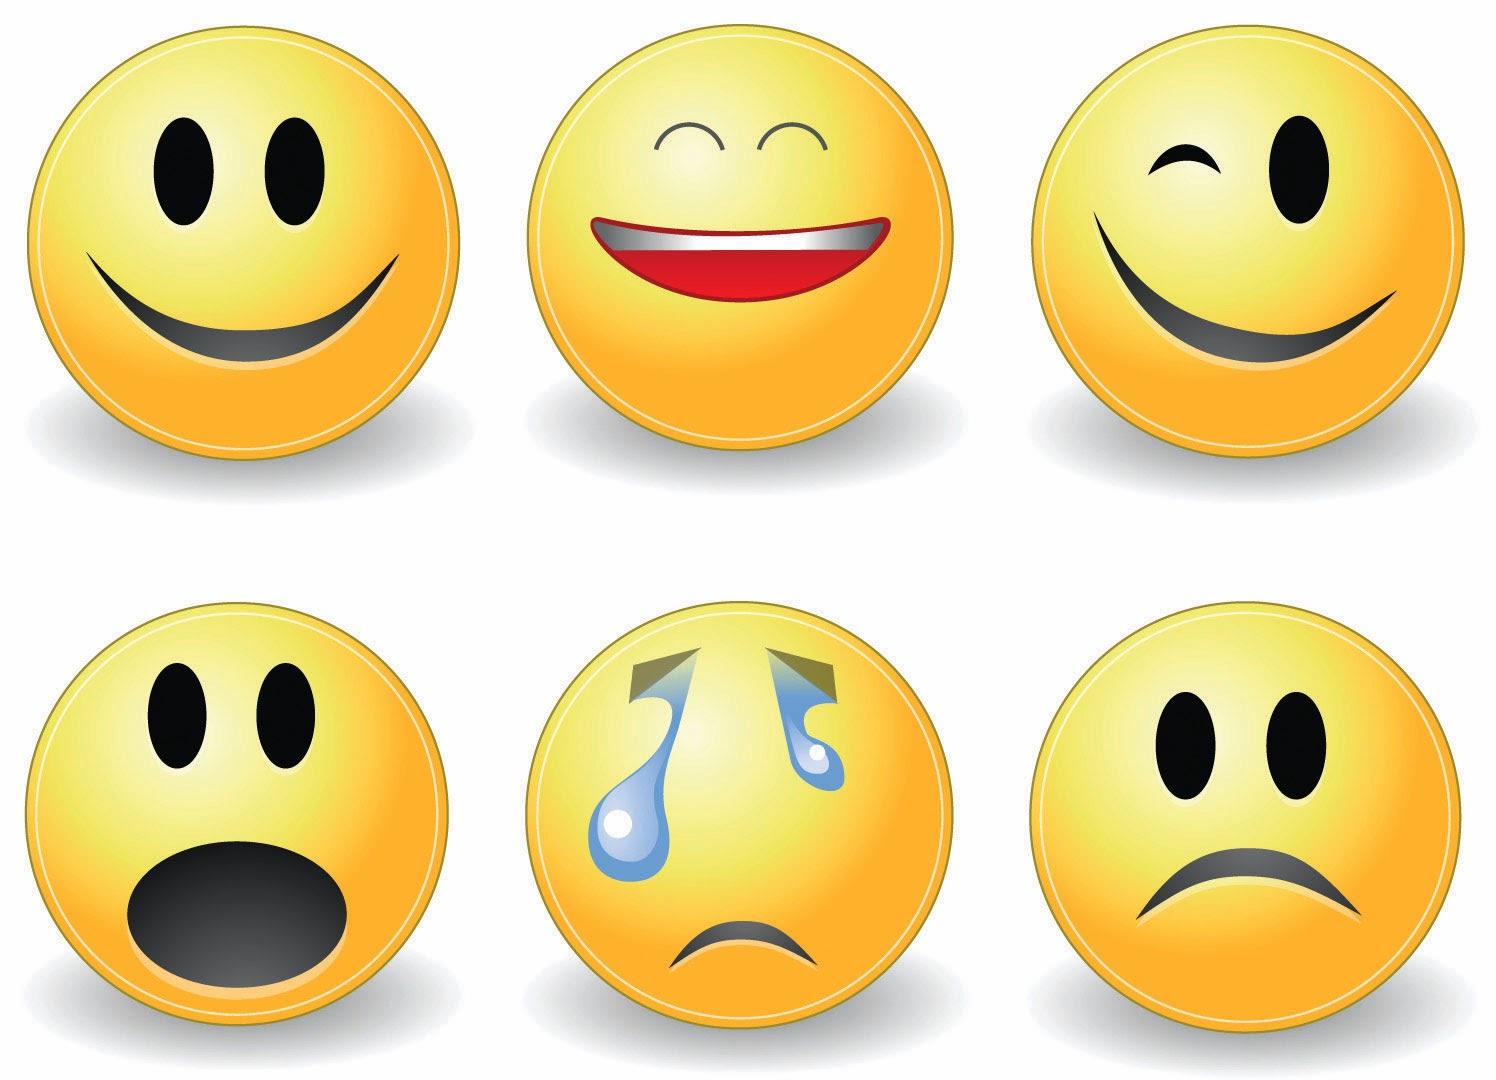 Lotus Notes Emoticons Lotus Notes Same Time Emoticons Animated Emoticons Smileys Symbols